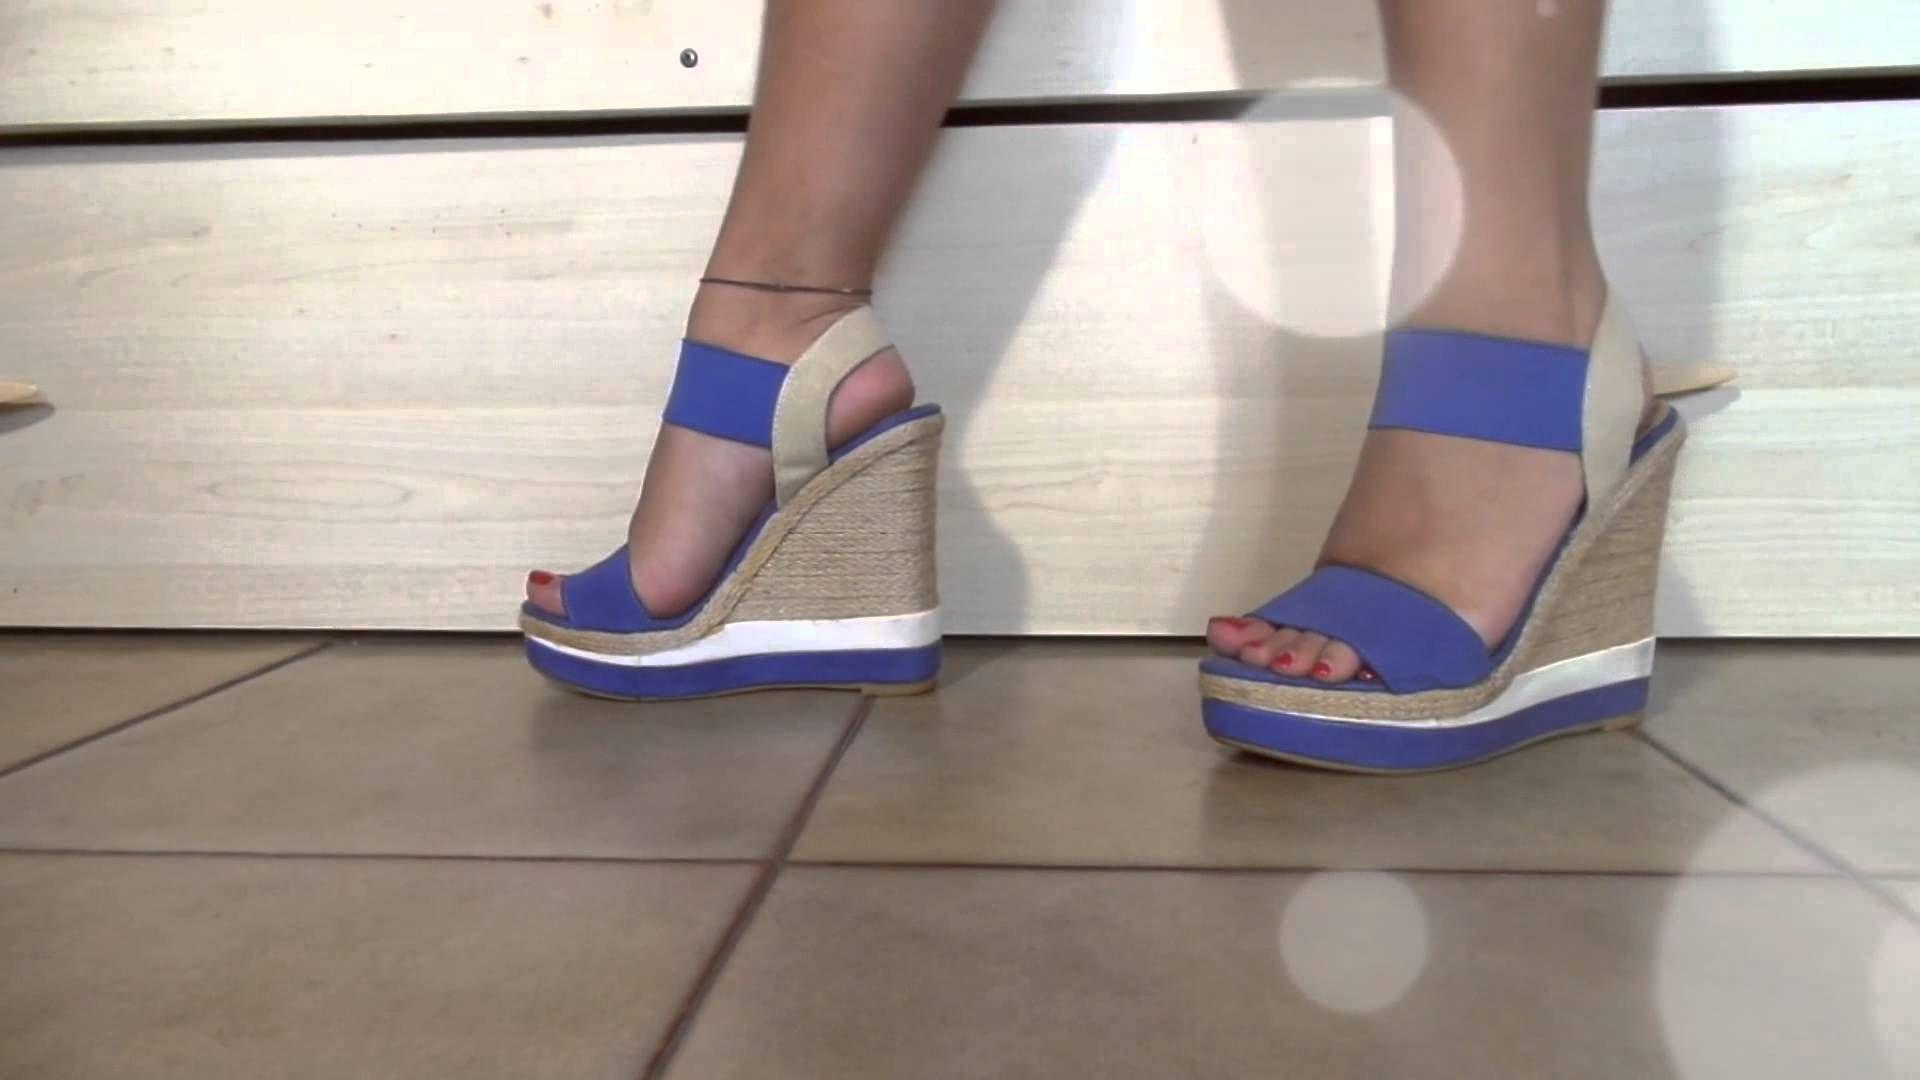 #My Summer Shoes - Le mie Preferite